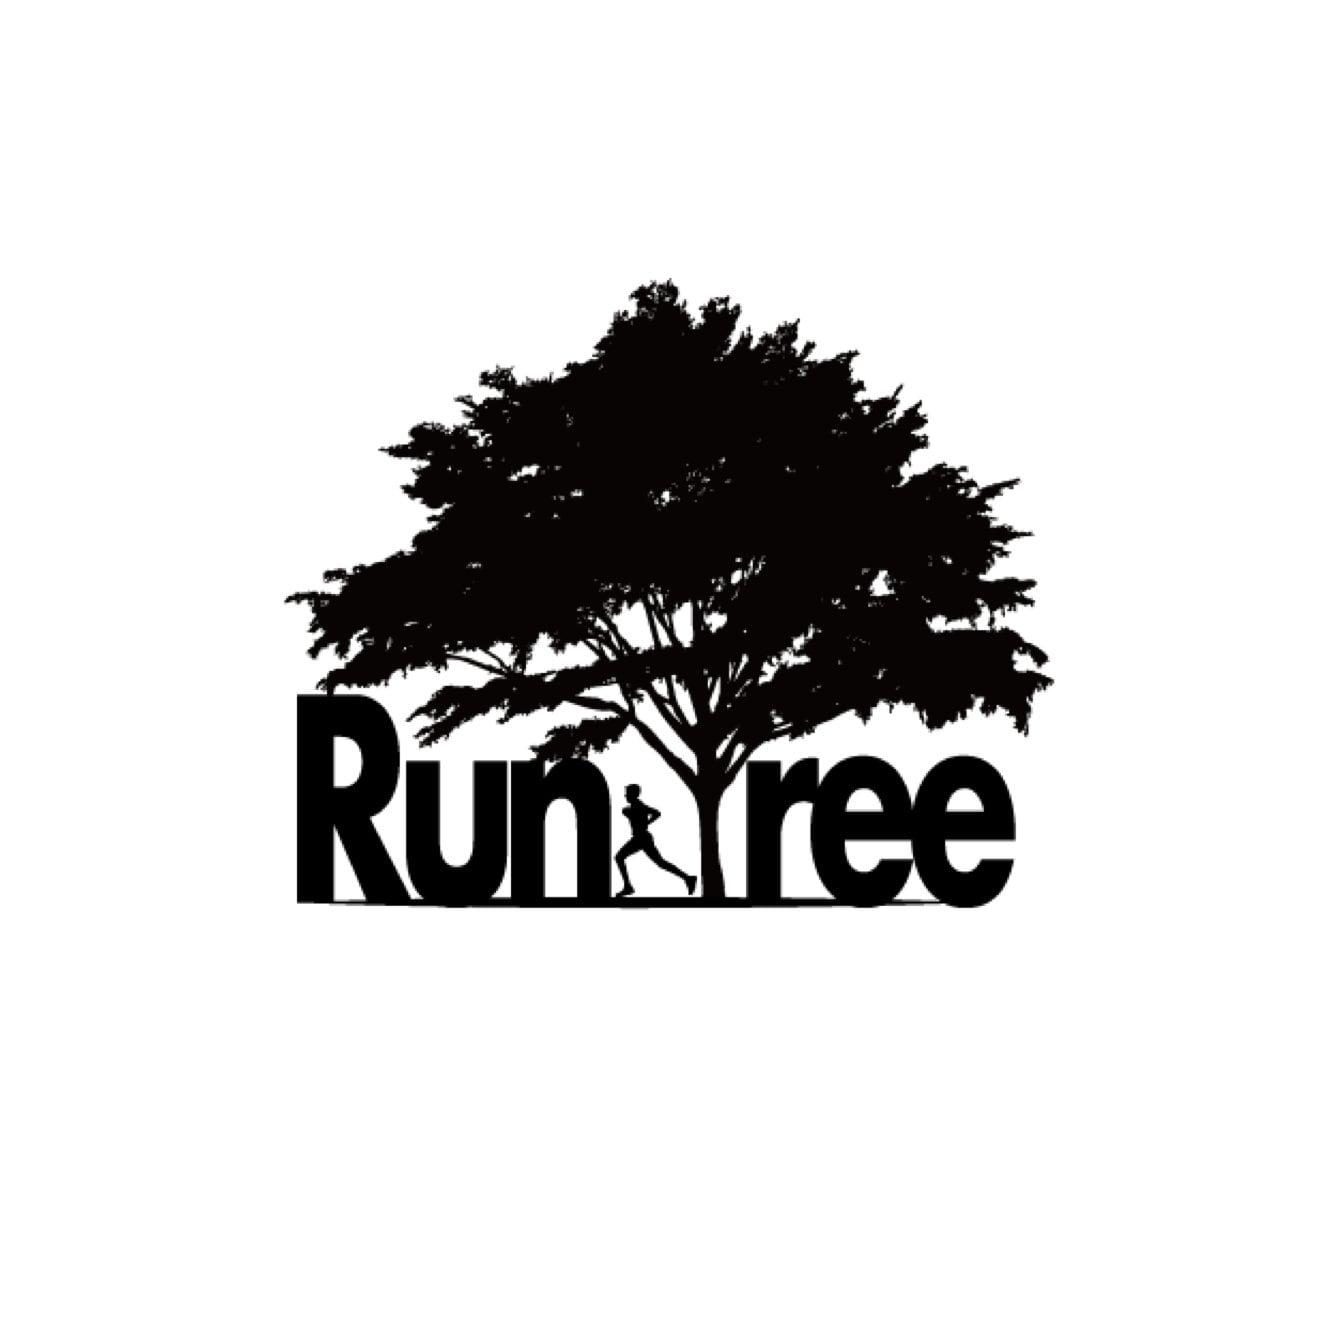 RunTree商品購入用ウェブチケットのイメージその1